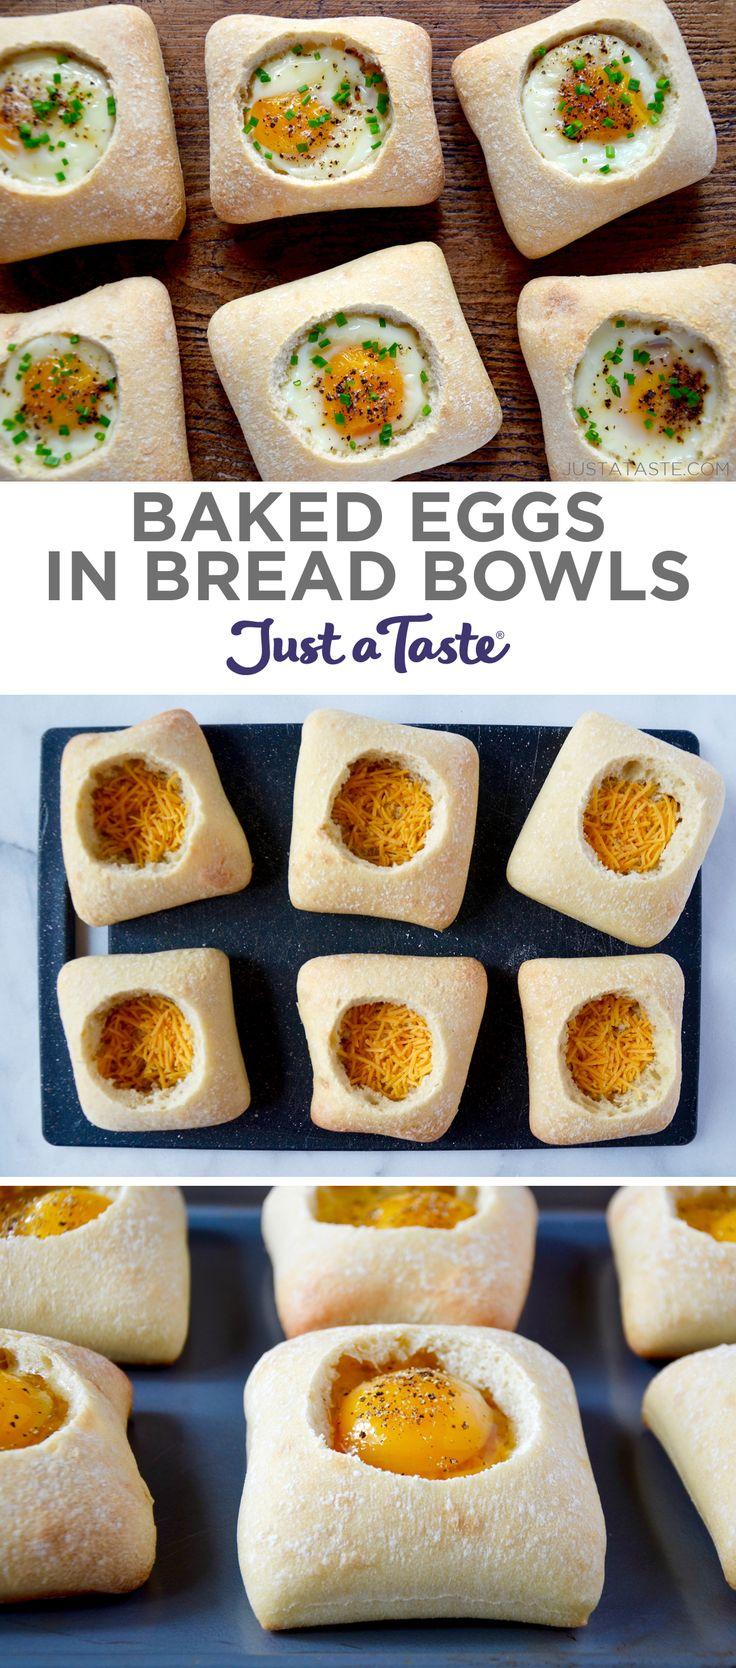 Baked Eggs in Bread Bowls recipe justataste.com #recipe #breakfast